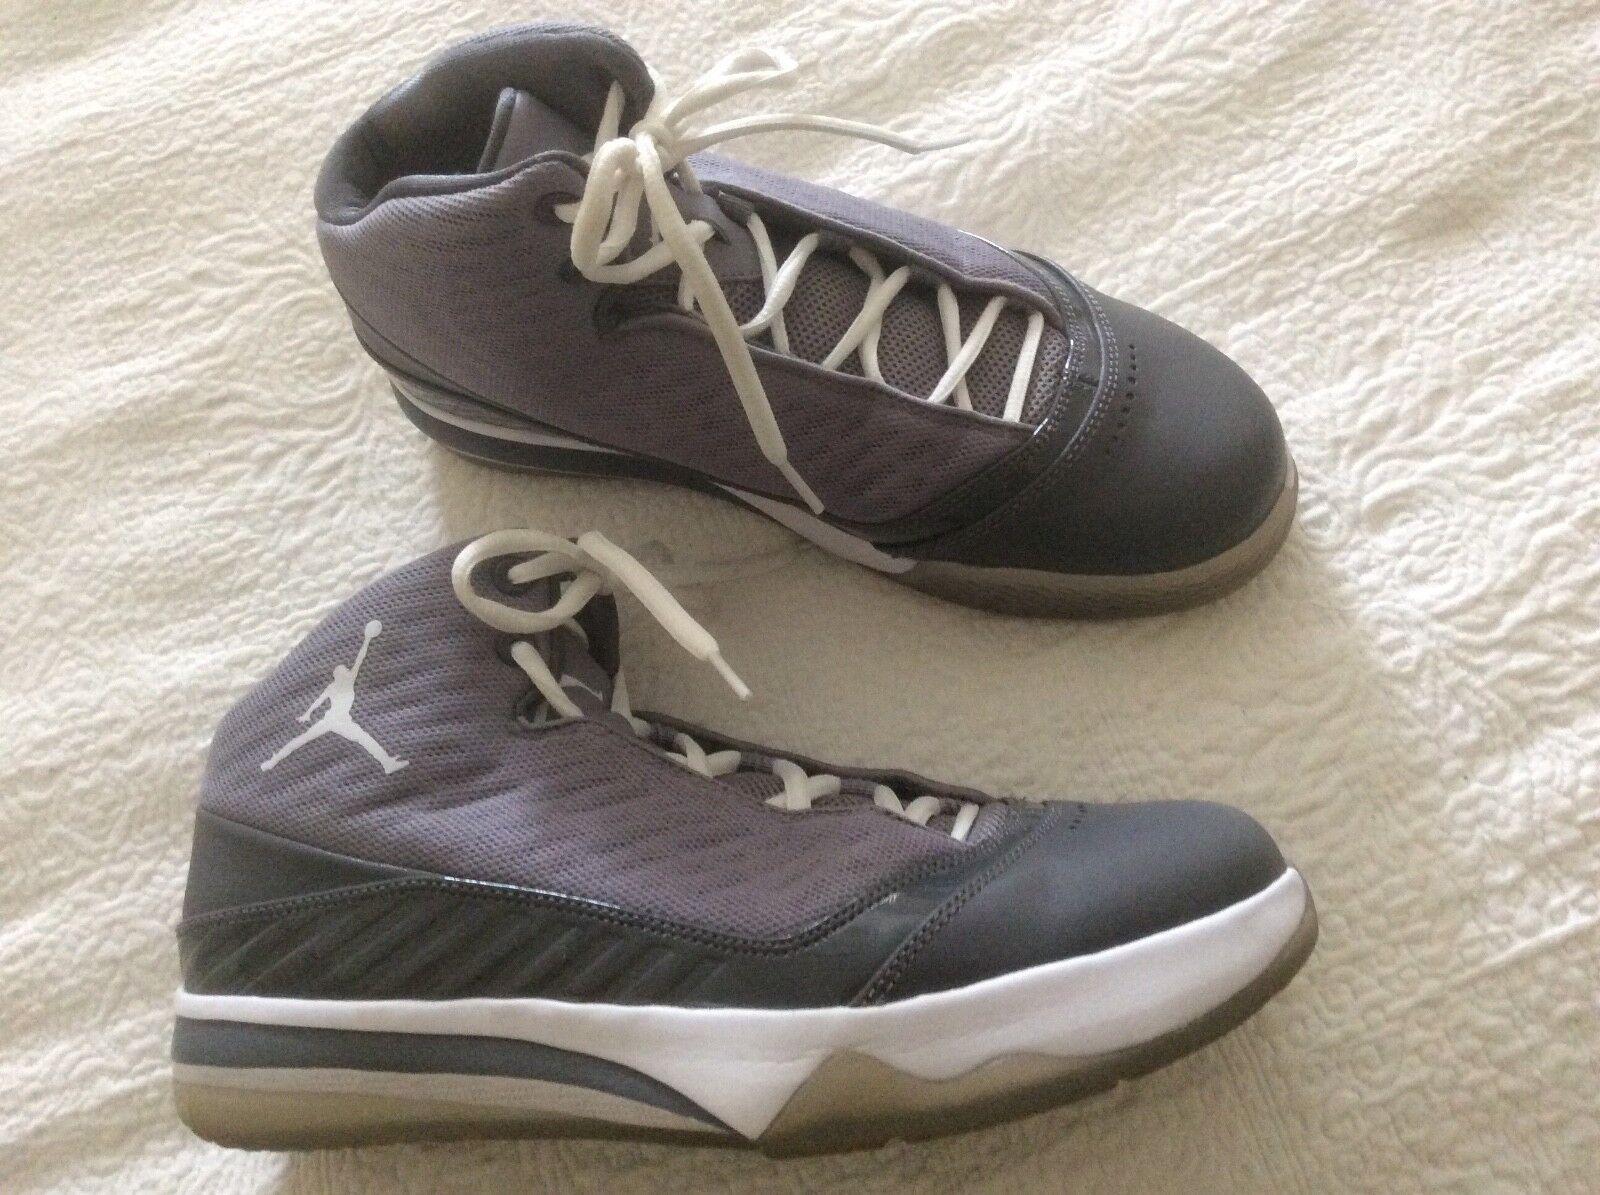 Mens  Jordan B'Mo Basketball Shoes 580590 003 Size 8.5 MINT